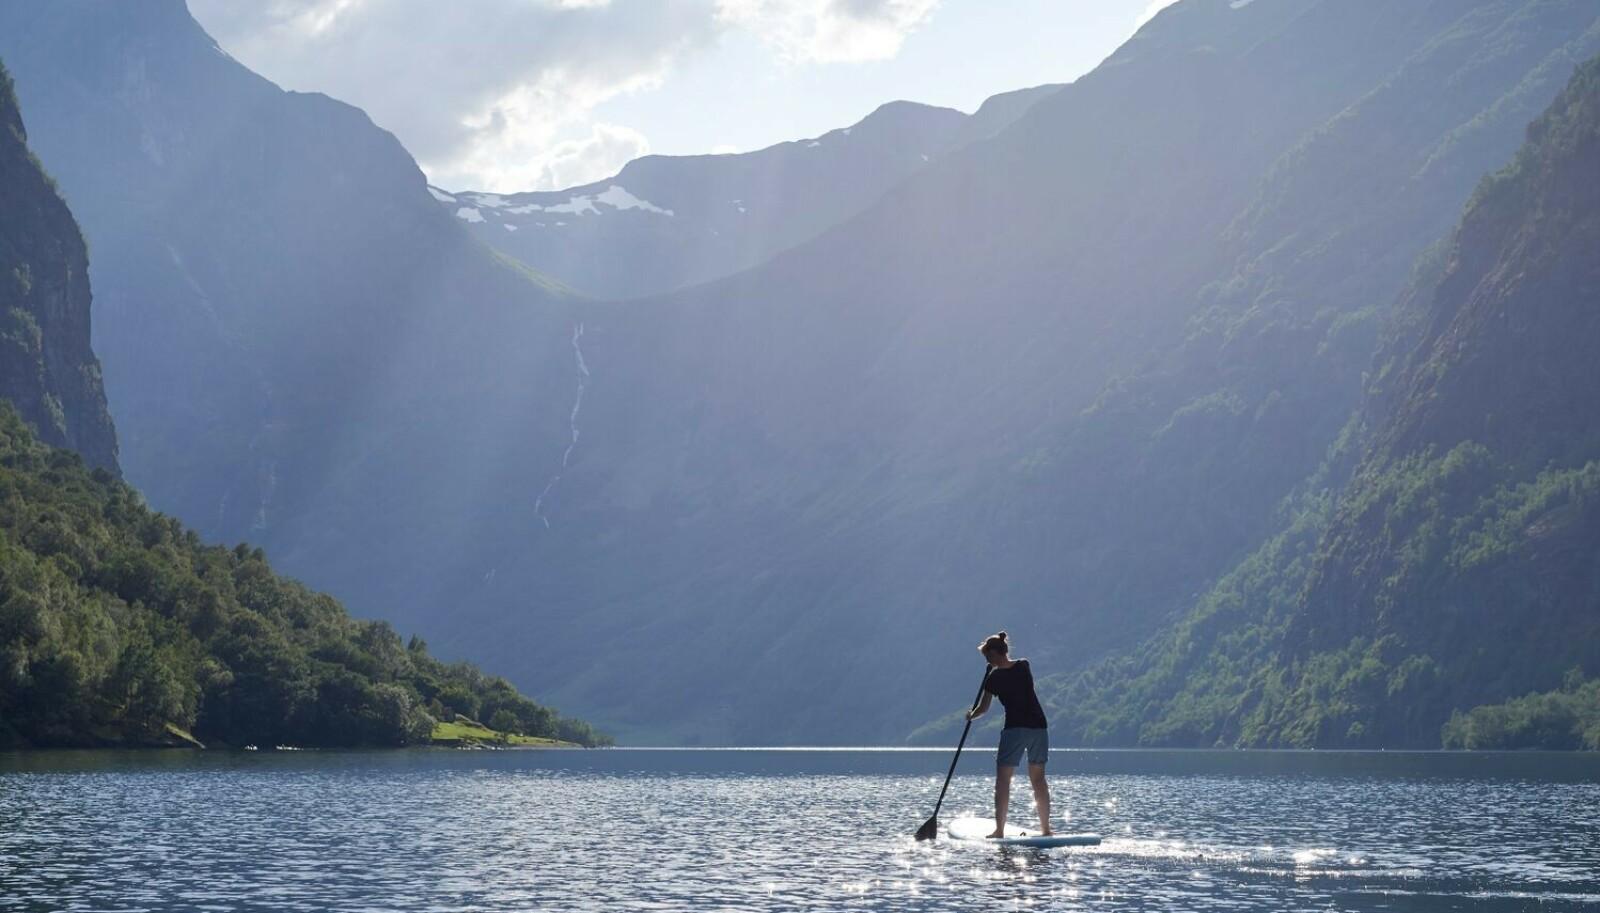 I VANNFLATEN: SUP eller ståpadling er blitt en populær aktivitet i norske fjorder, som her i Nærøyfjord. FOTO: Visitnorway.no